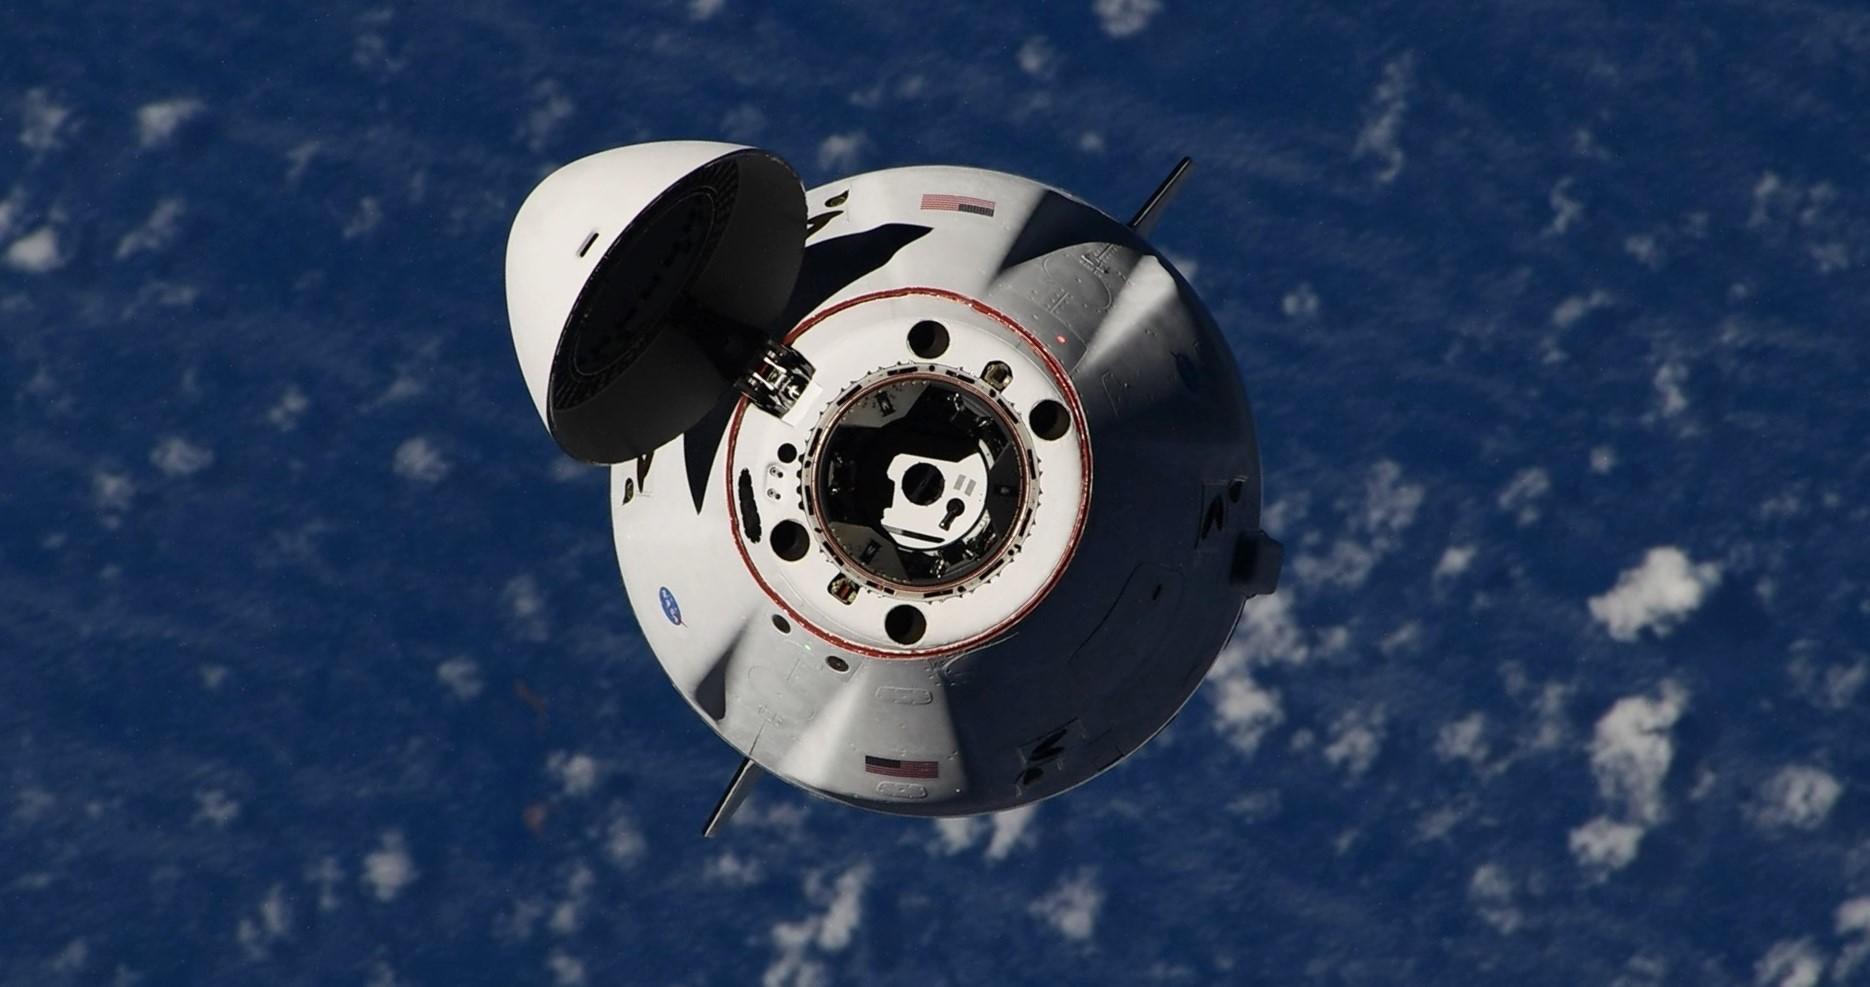 Cargo Dragon 2 C208 CRS-23 ISS arrival 083021 (Thomas Pesquet – ESA) 4 crop